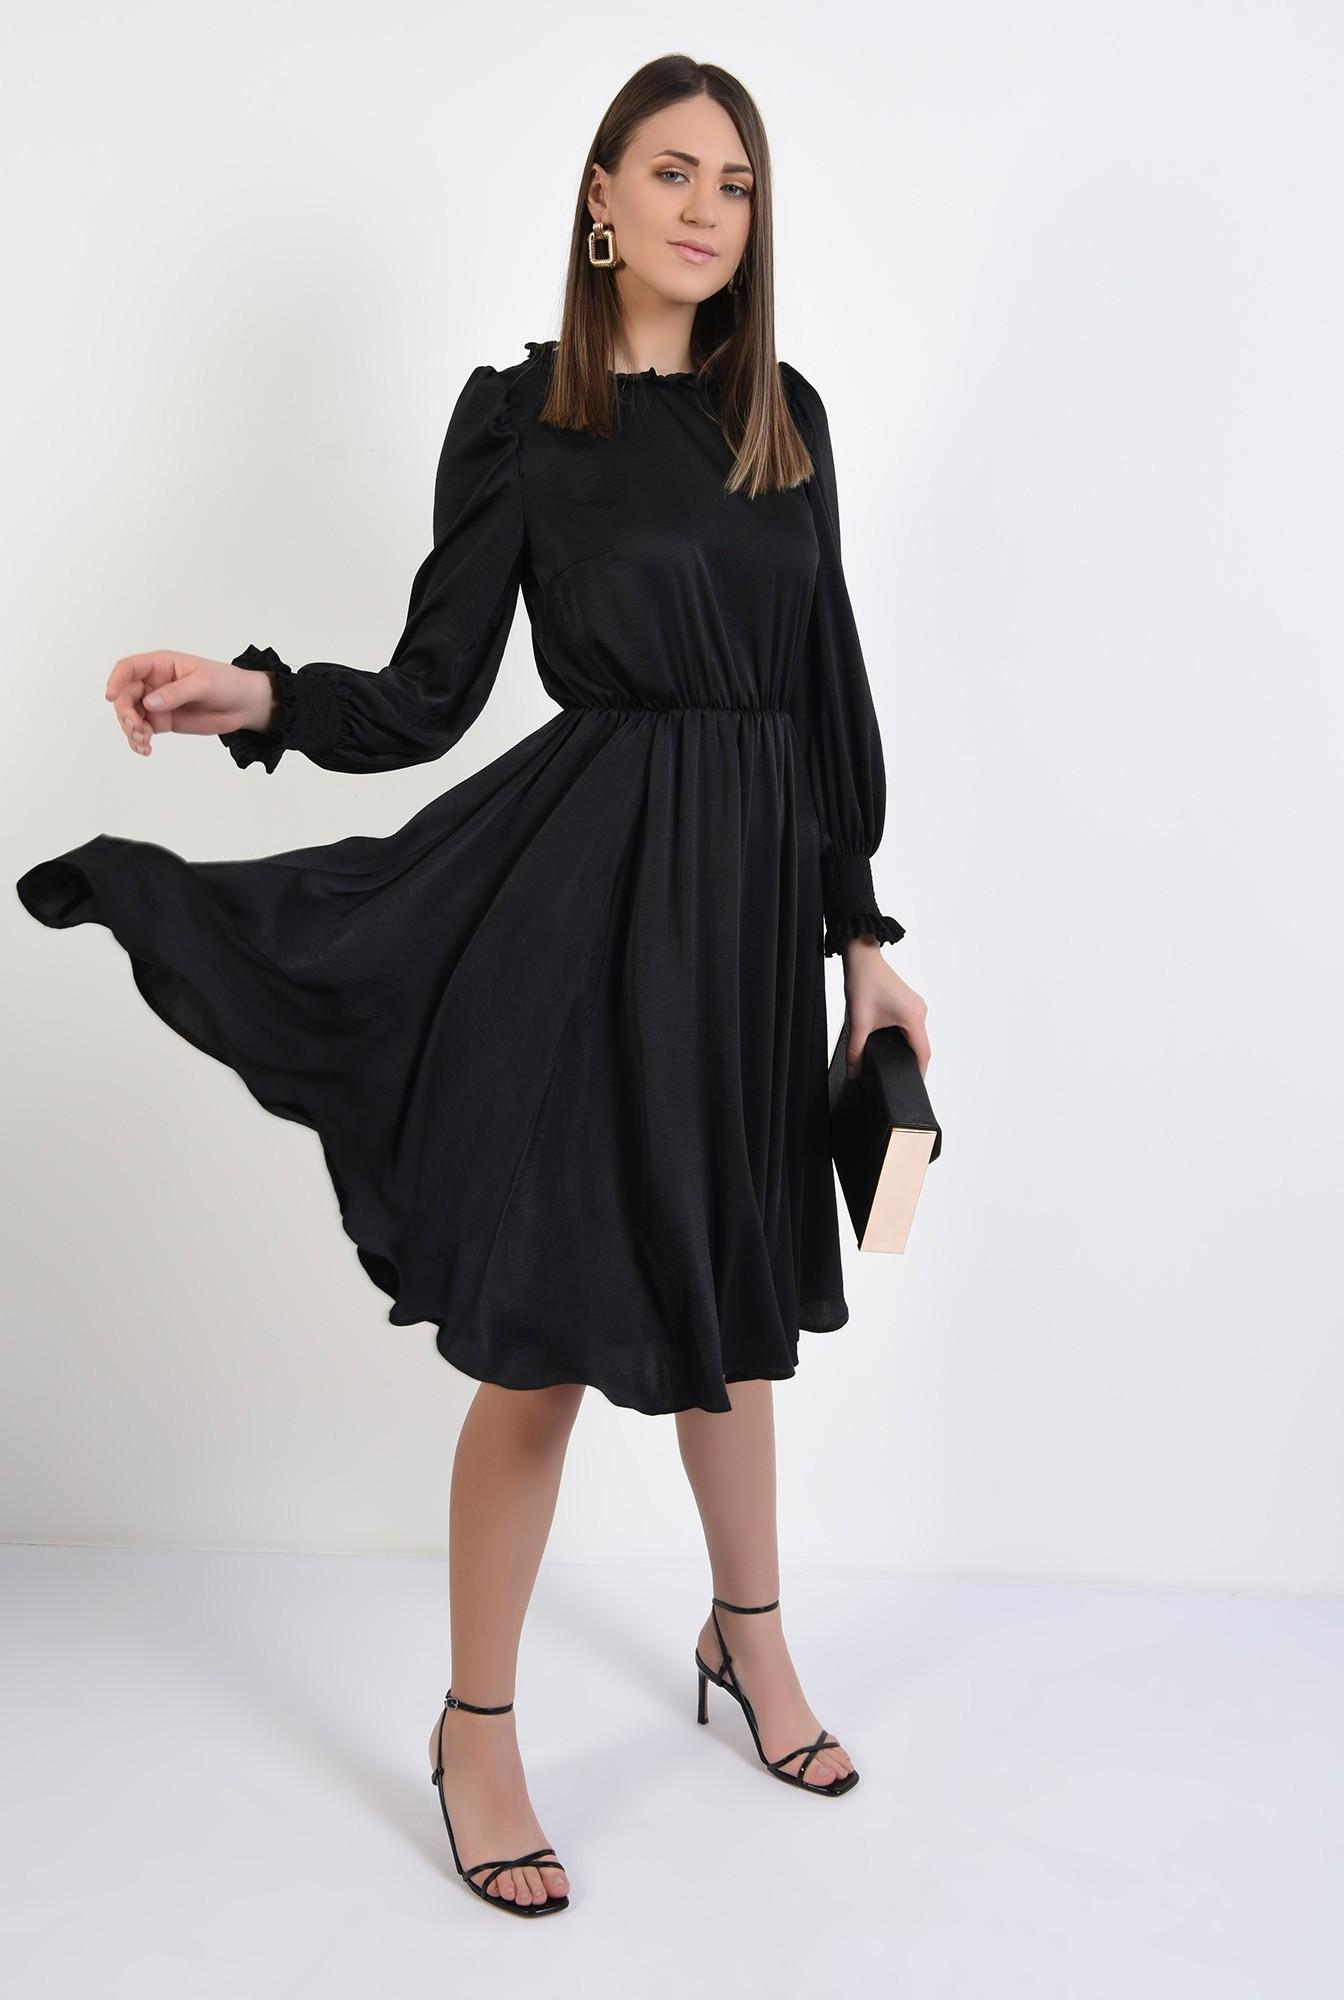 3 - rochie midi, evazata, guler incretit, talie pe elastic, inchidere cu butoniera